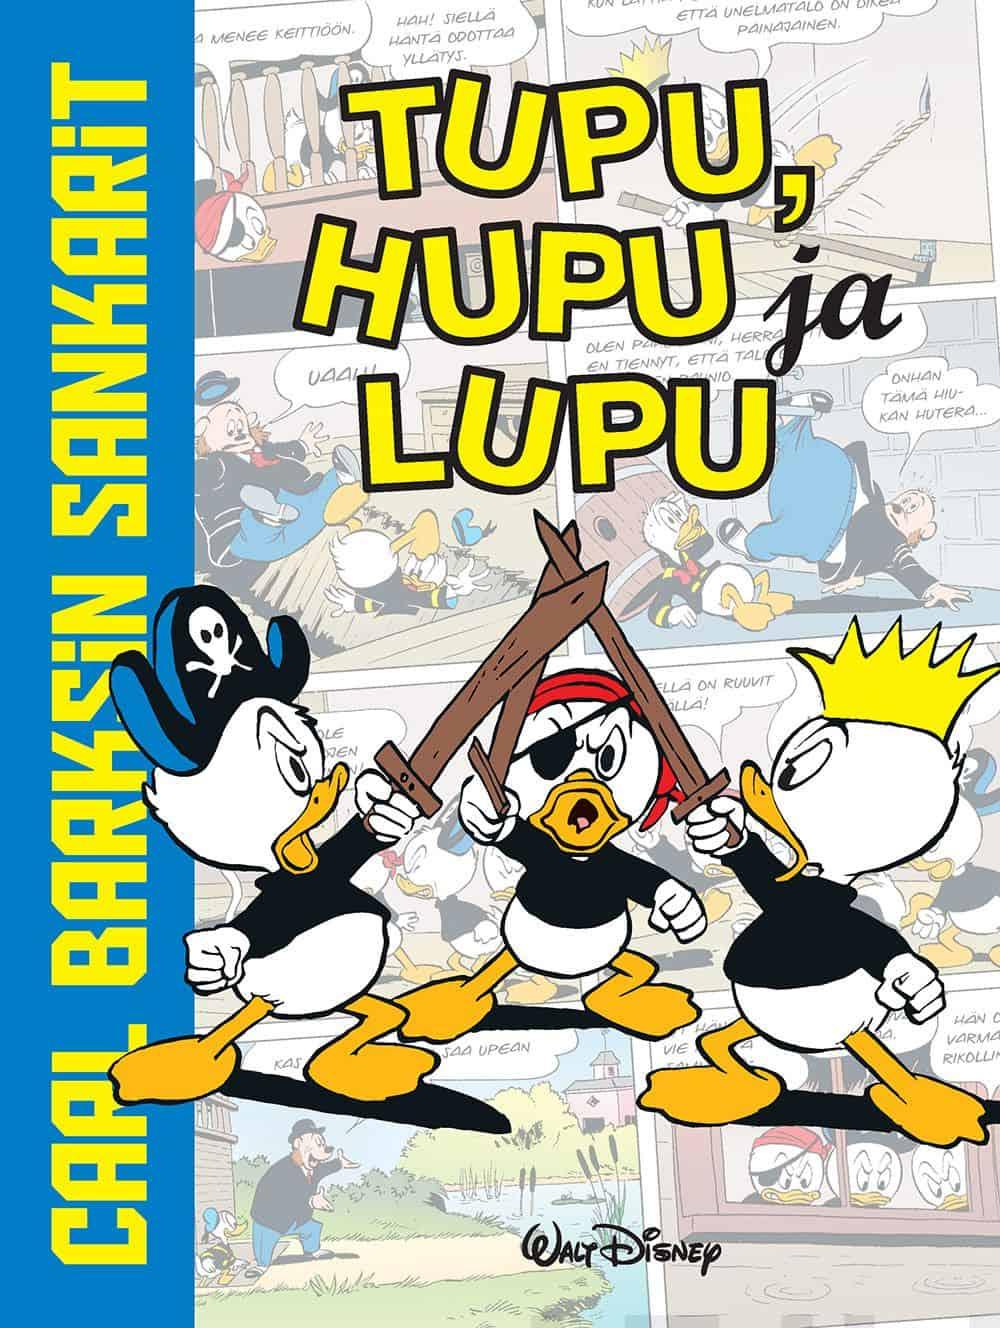 Carl Barksin sankarit: Tupu, Hupu ja Lupu